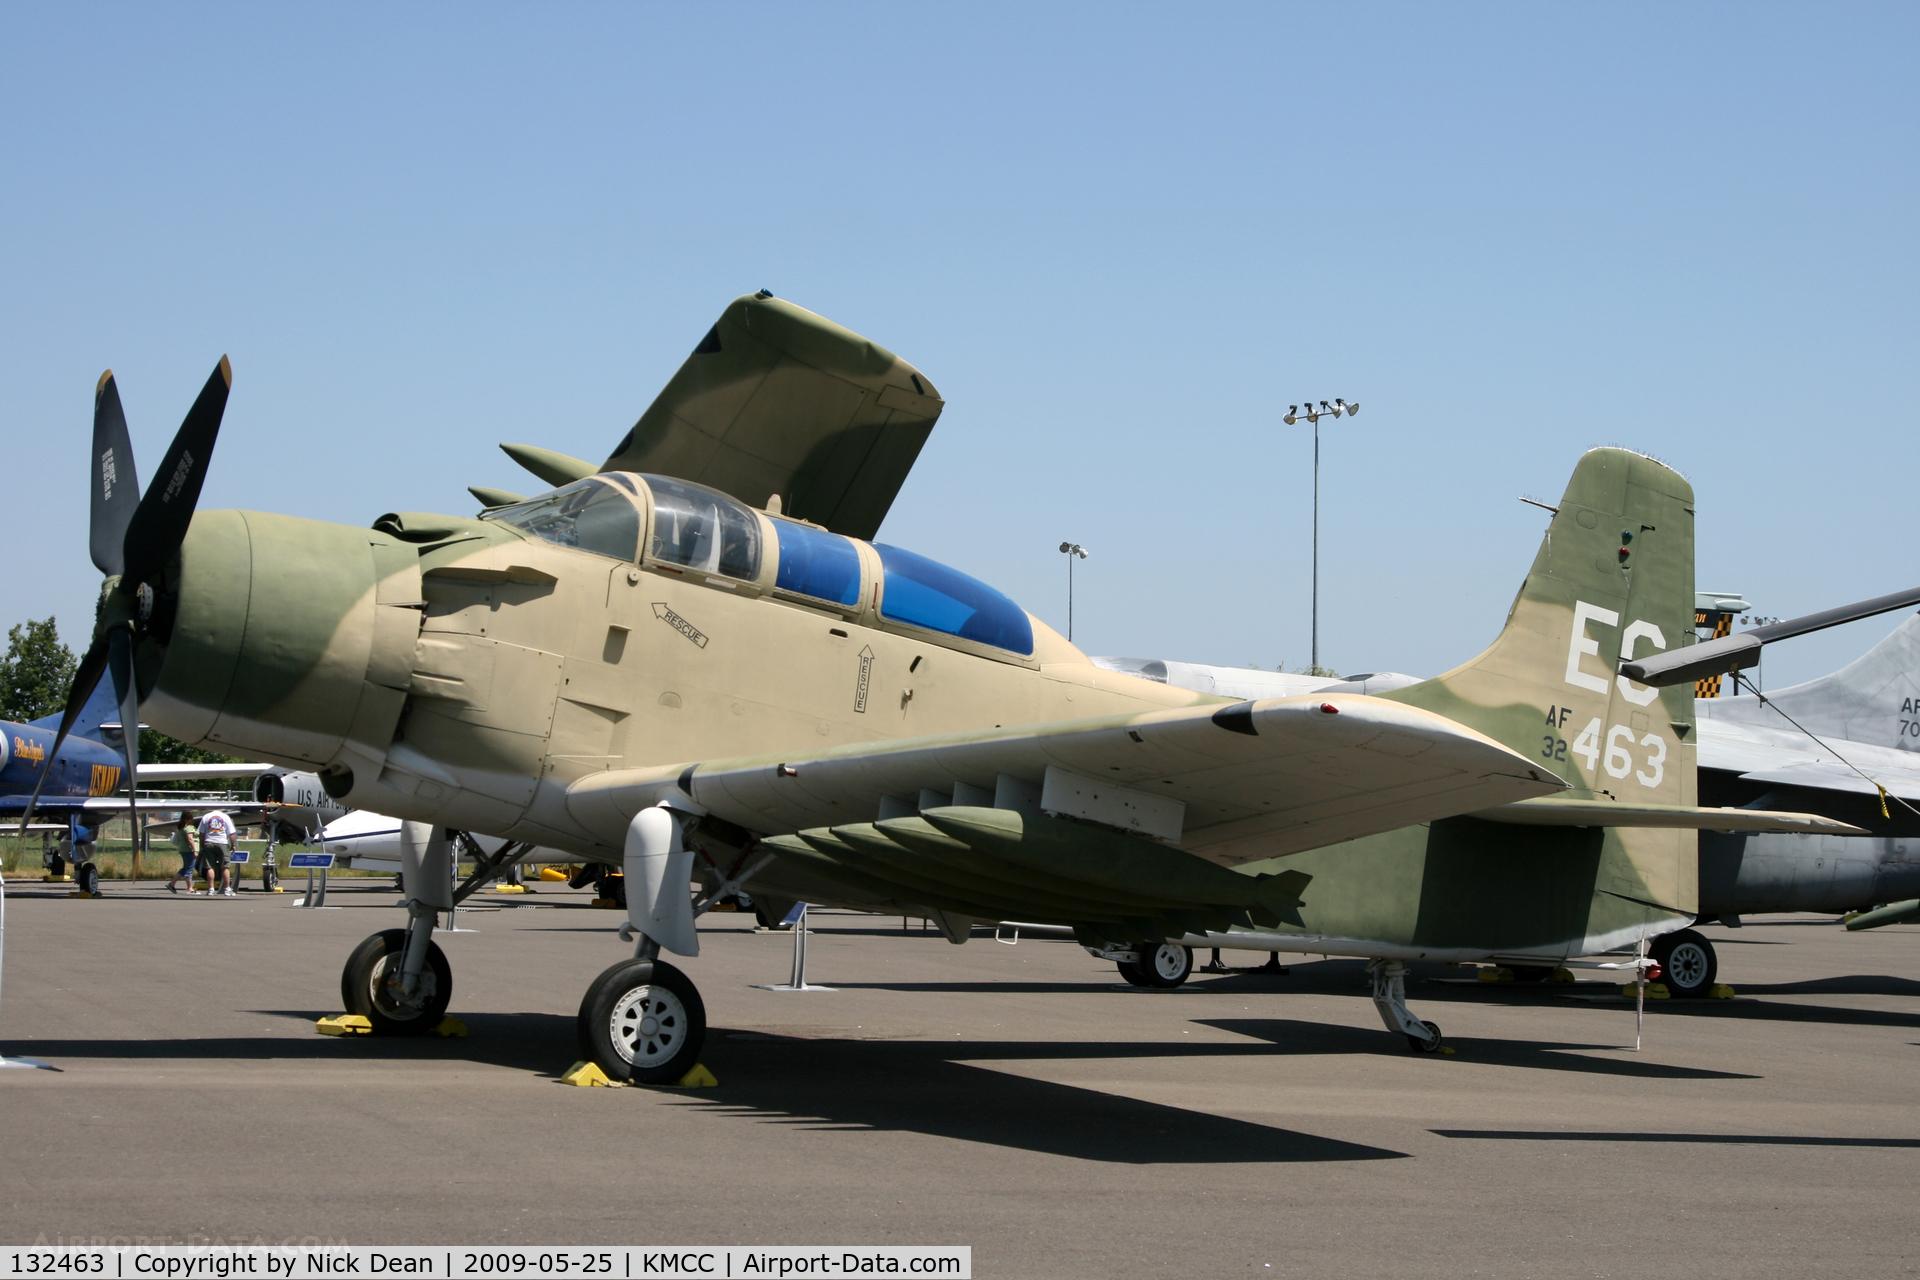 132463, Douglas A-1E Skyraider C/N 9480, KMCC